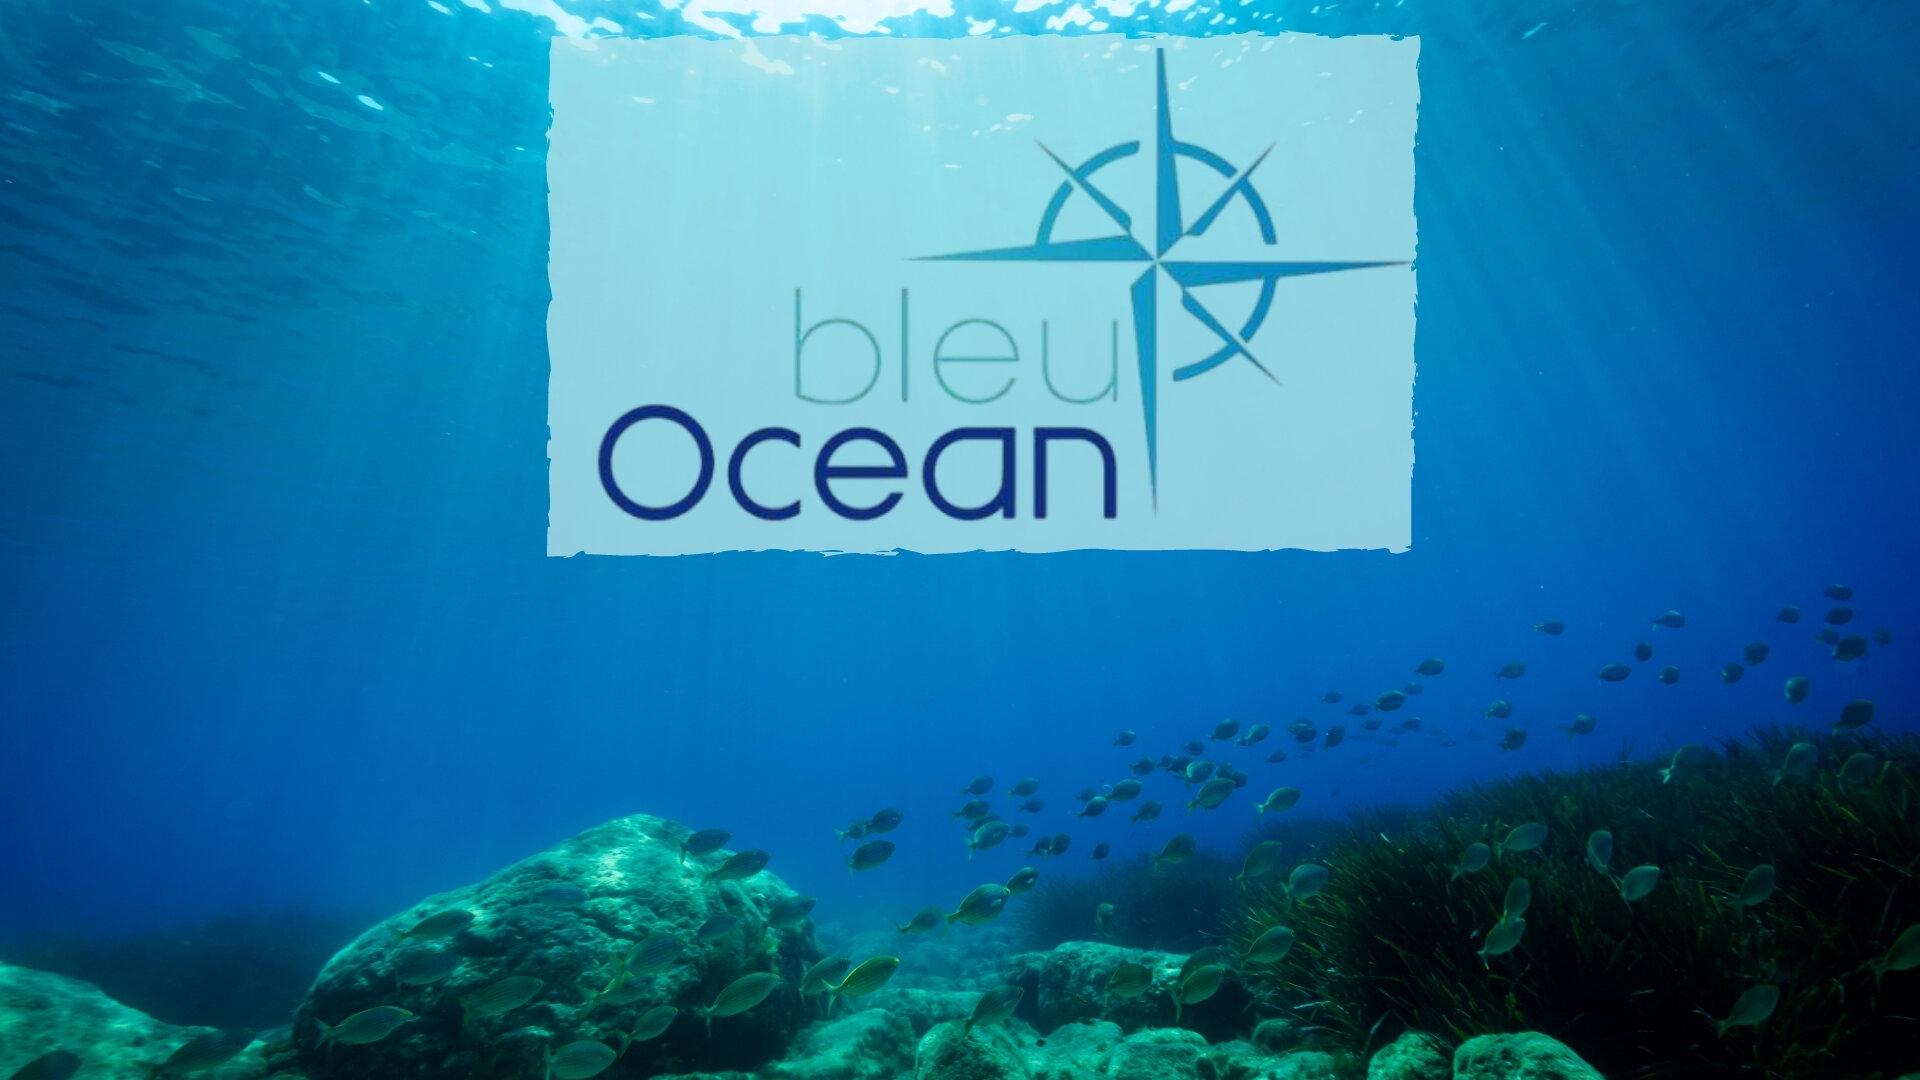 Bleu océan : les pirogues en résine